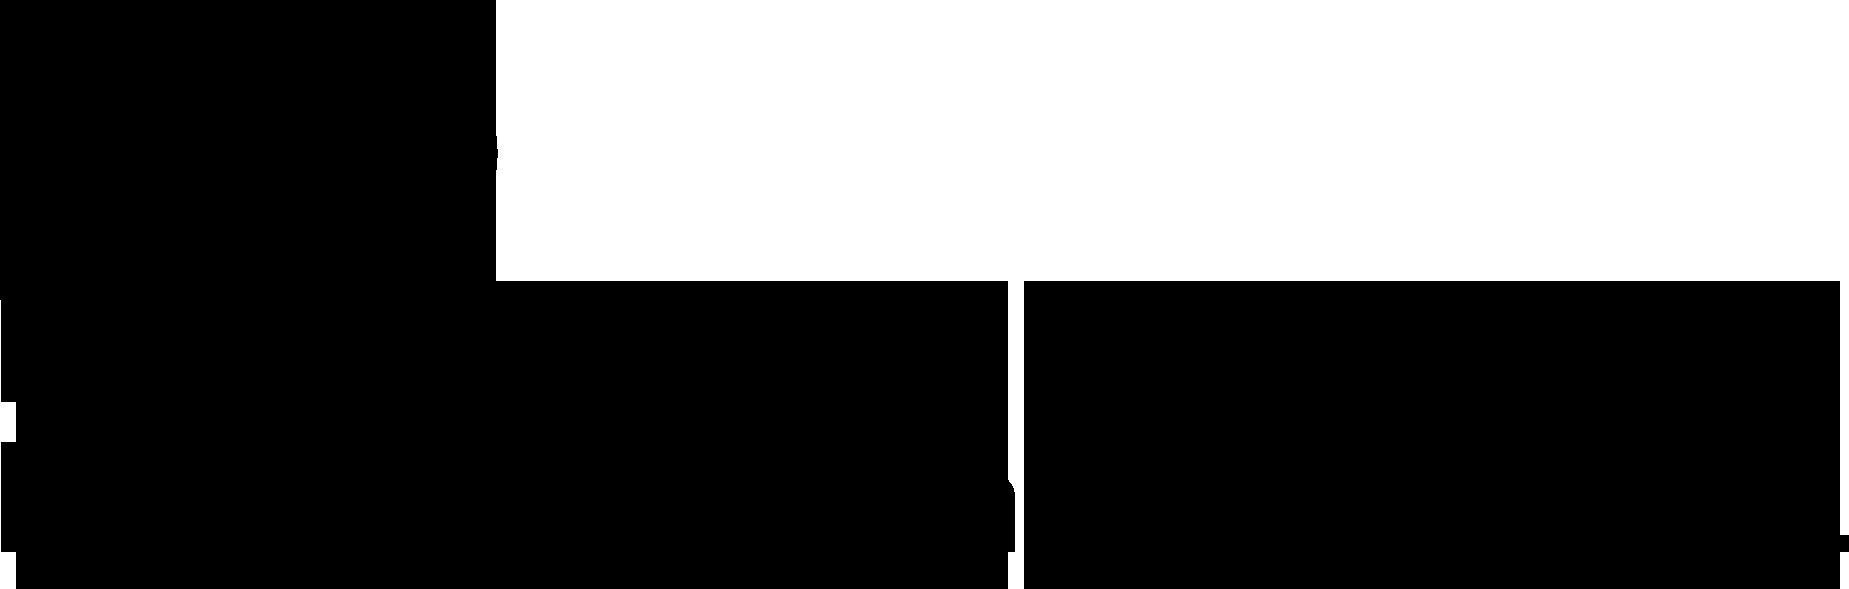 ifkp-groß